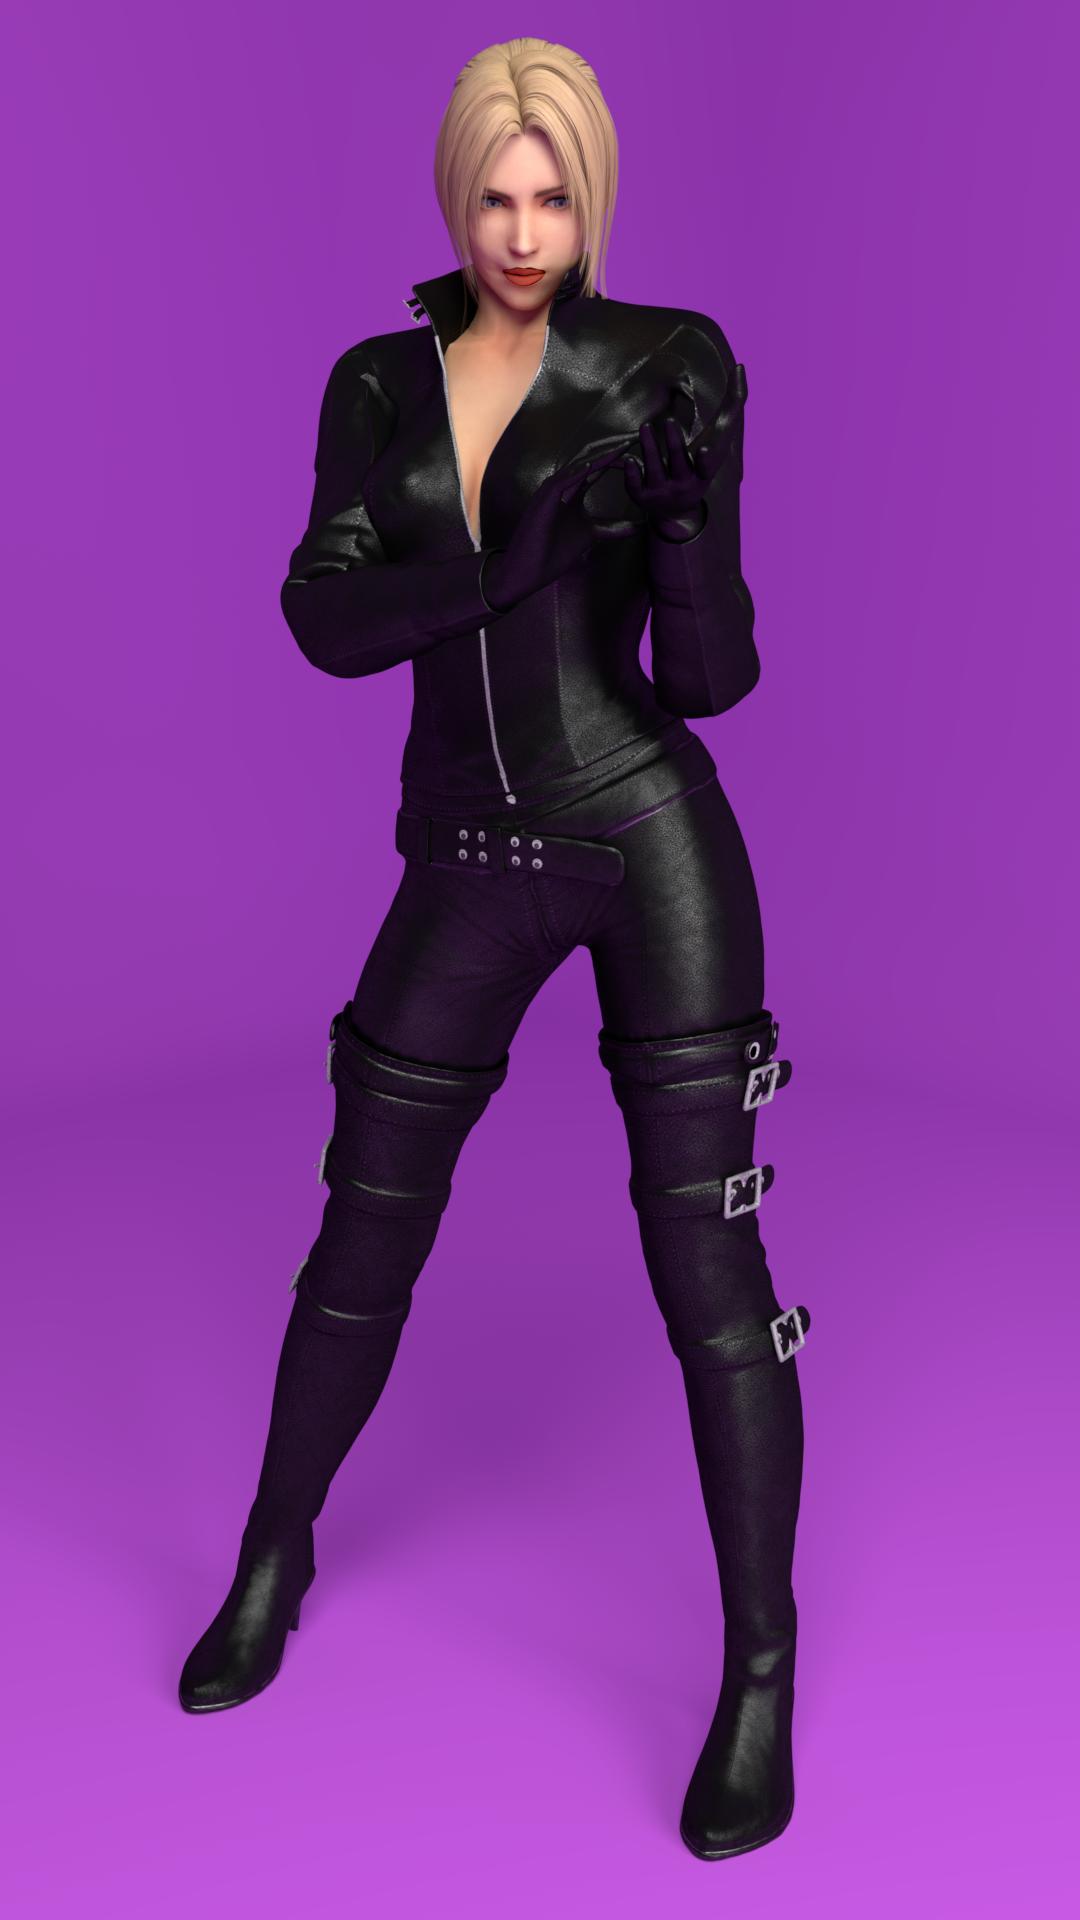 Introducing Nina Williams Tekken 7 Story Outfit By Philosophoholic163 On Deviantart